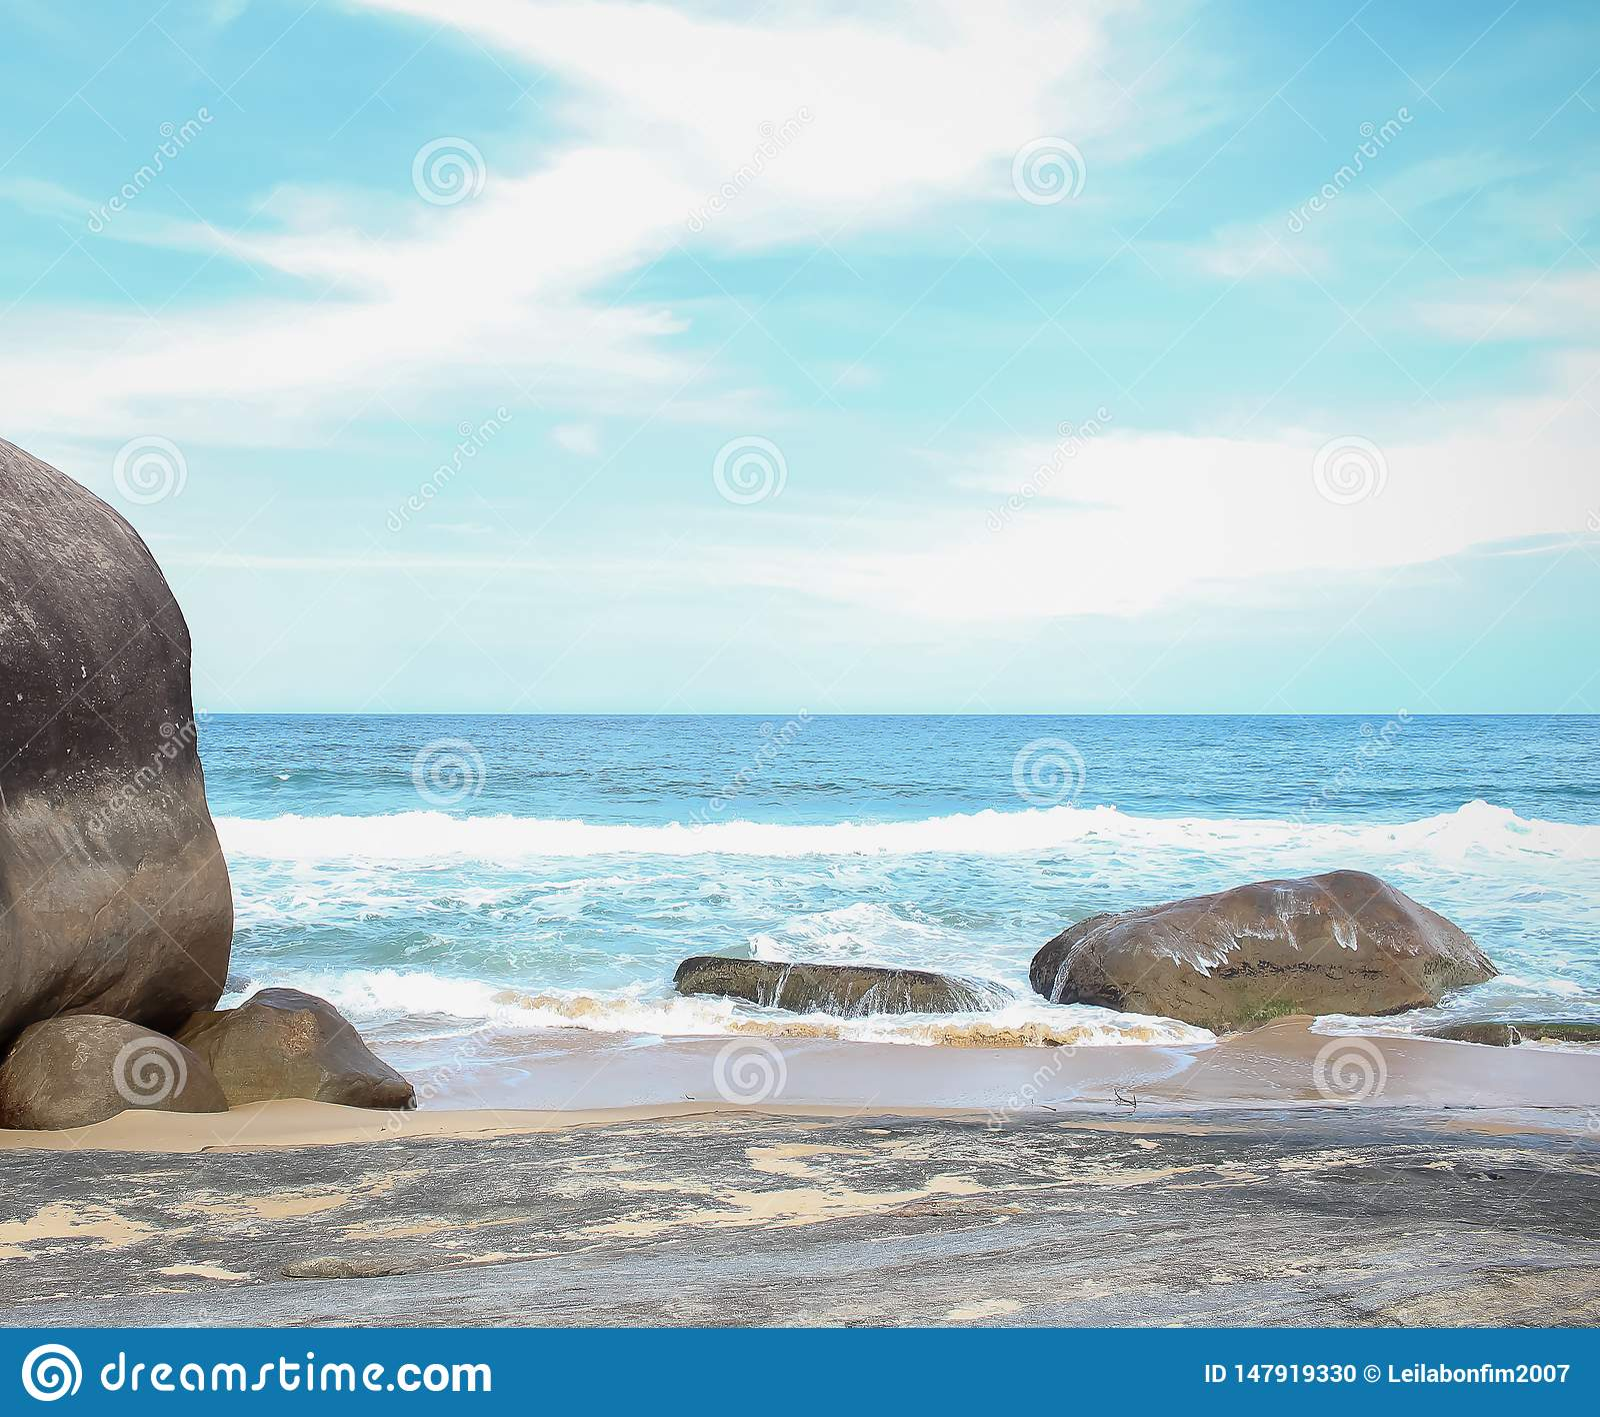 Den stora stenen i havet